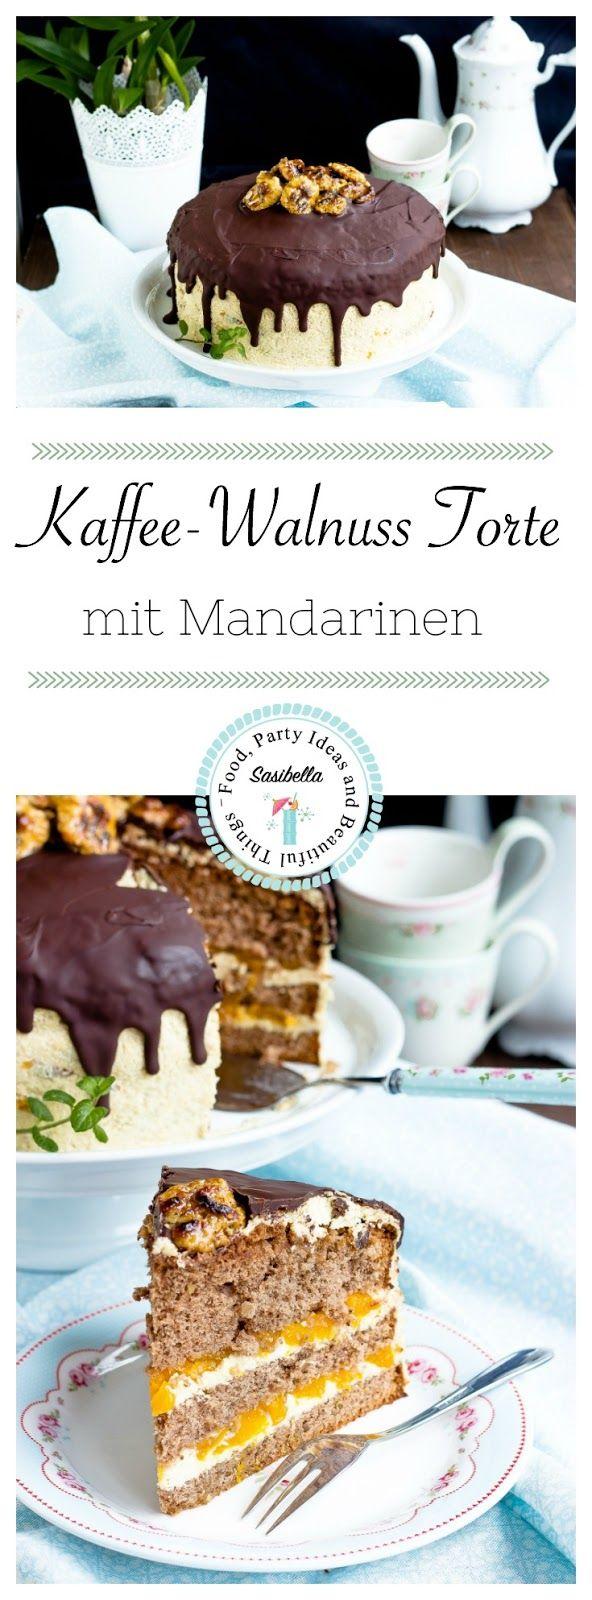 Kaffee Walnuss Torte Mit Mandarinen Betonkunst Pinterest